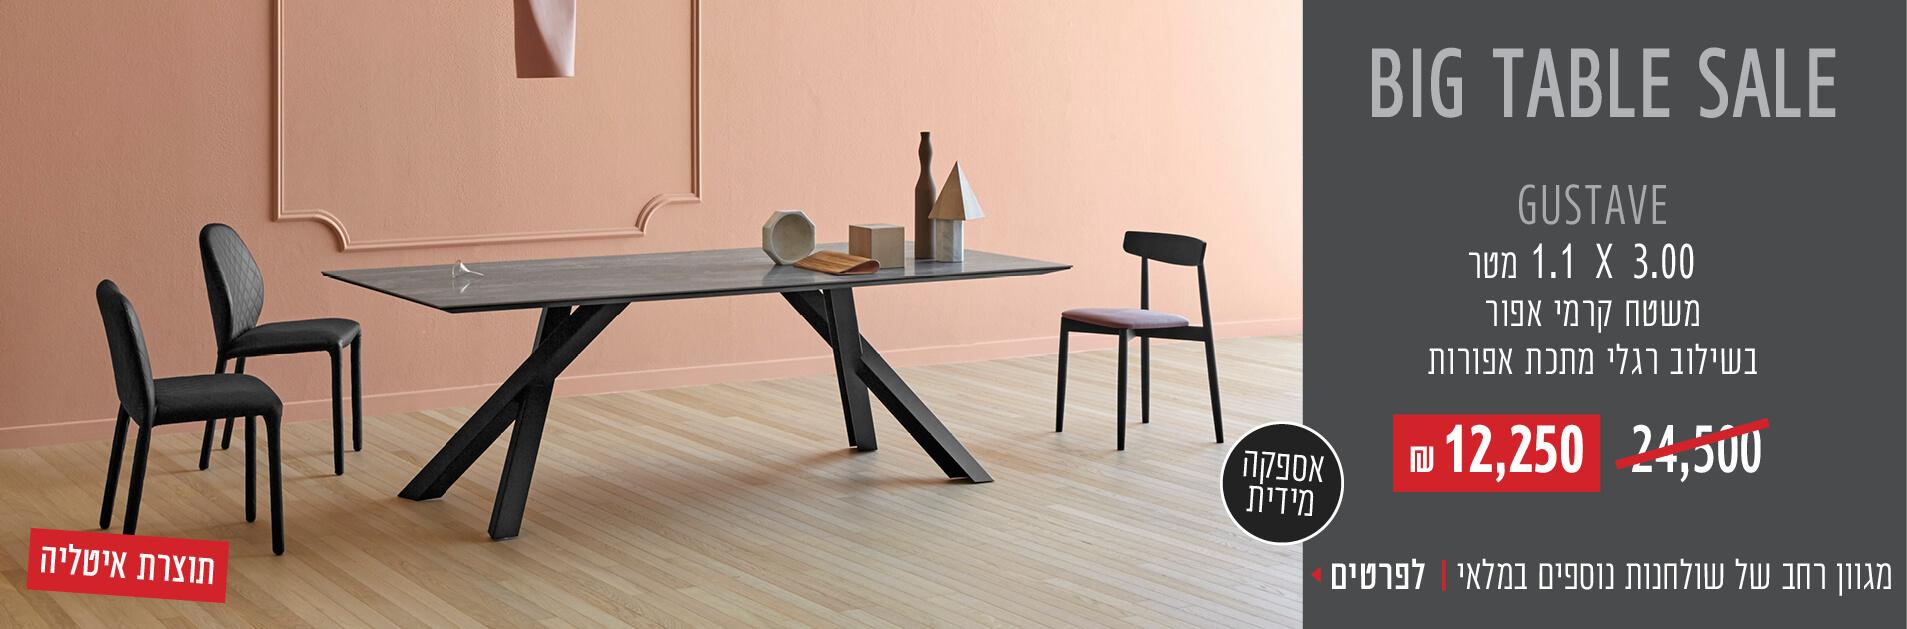 table_sale3